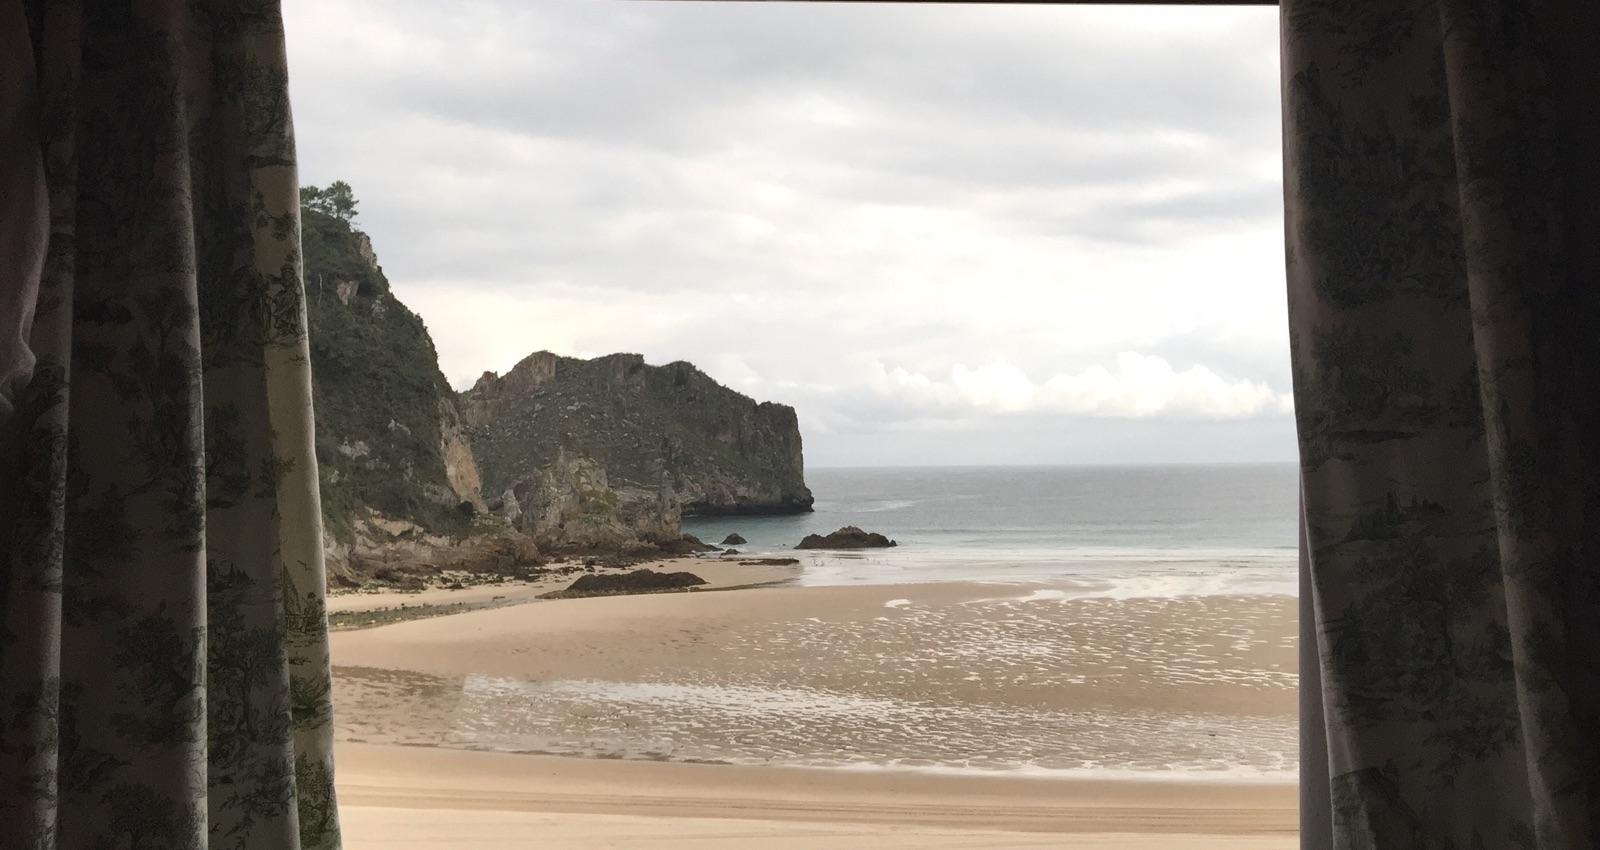 Playa de La Franca. Ribadedeva (Asturias). Por Omar Cervera Gil